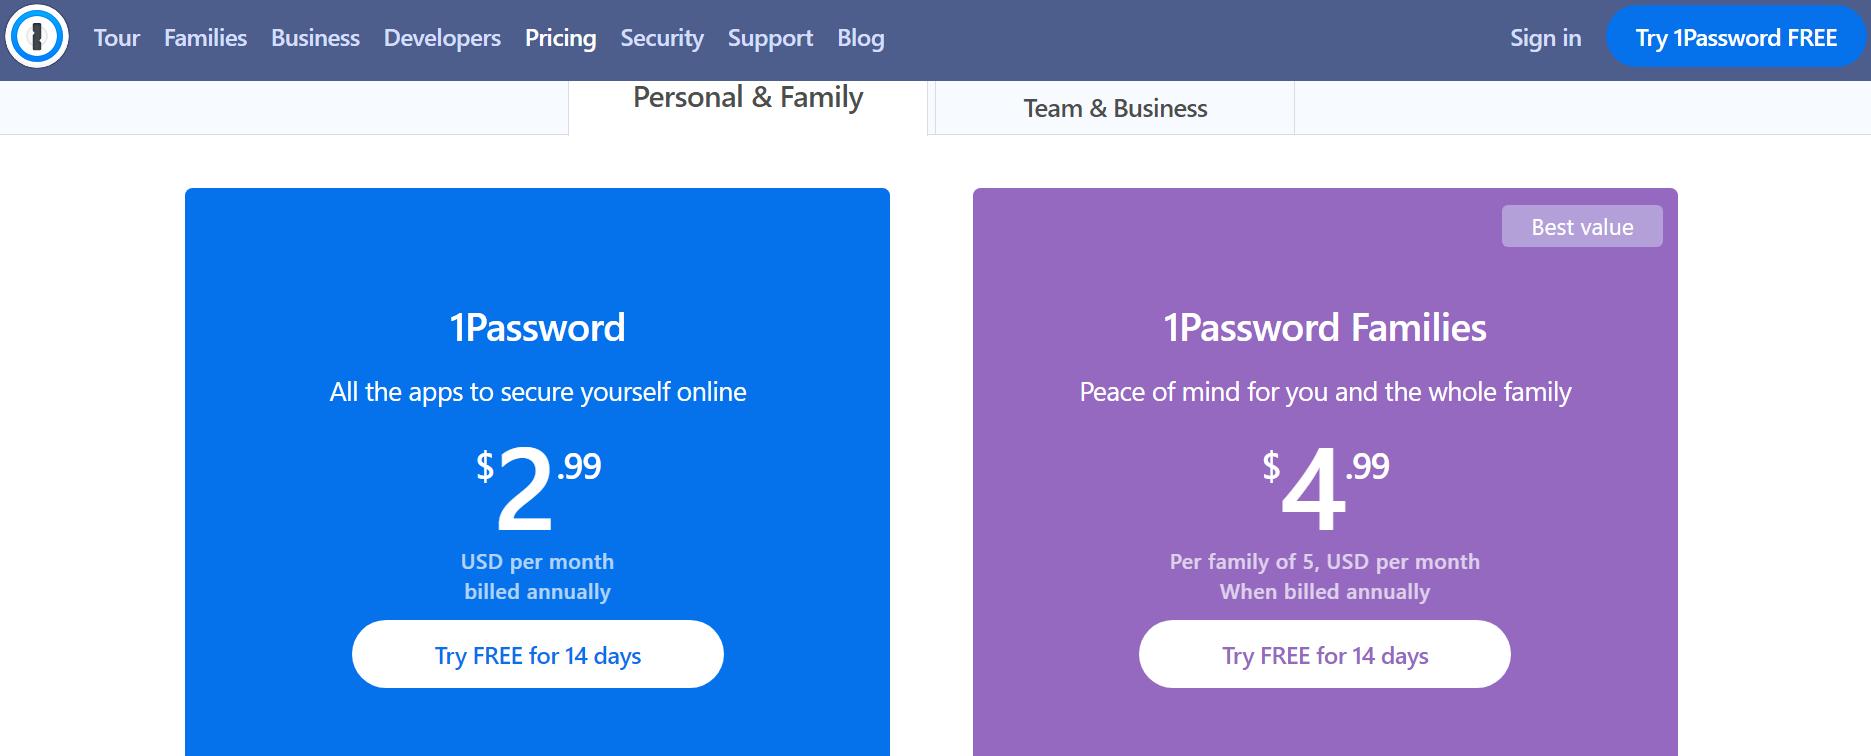 1Password Pricing